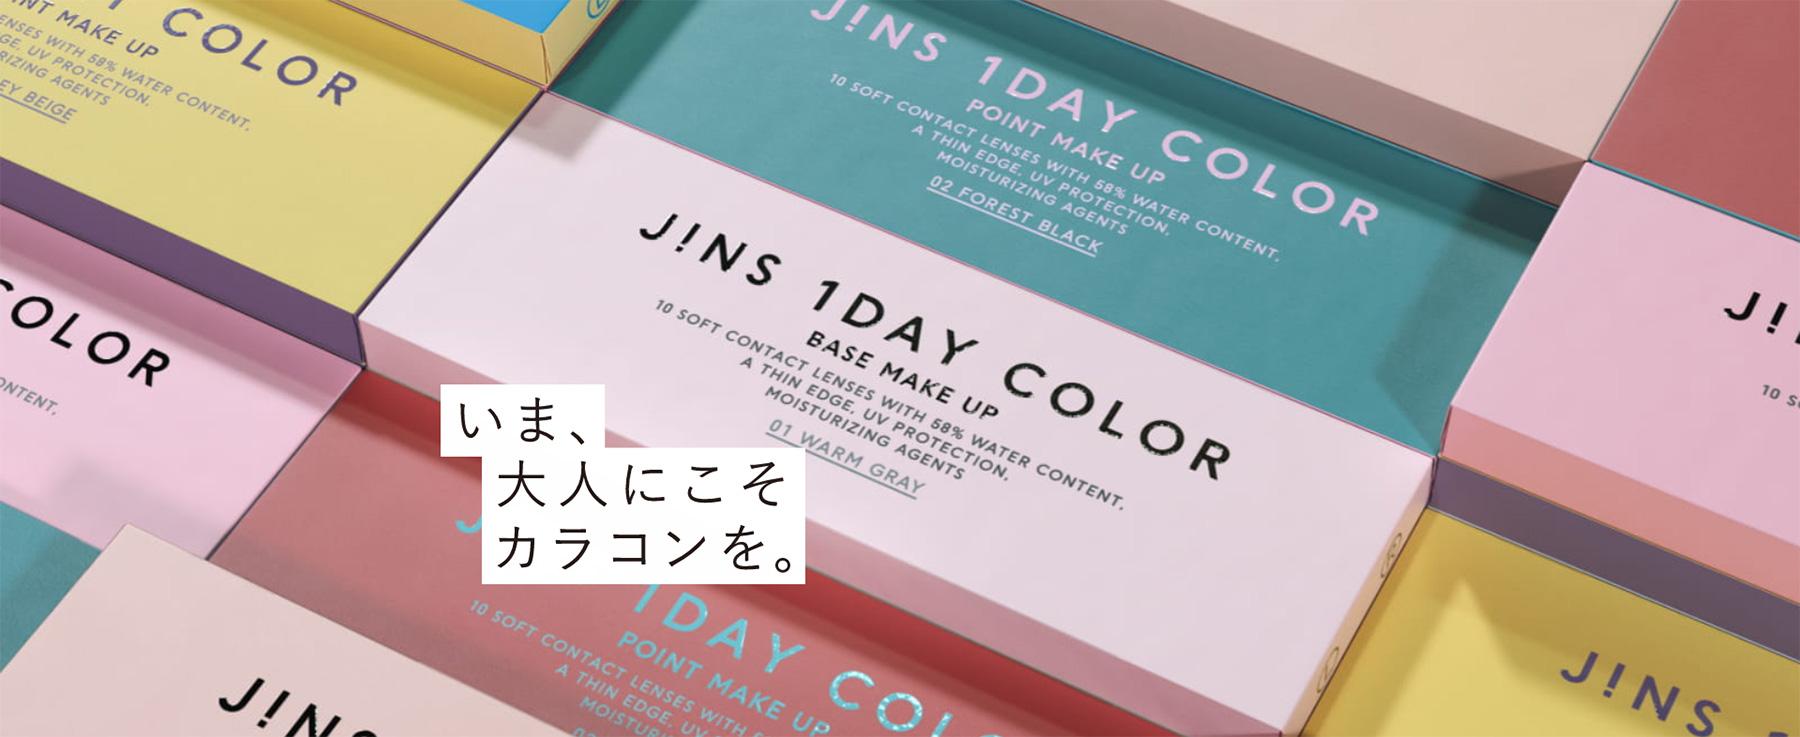 JINS 1dayカラーコンタクト